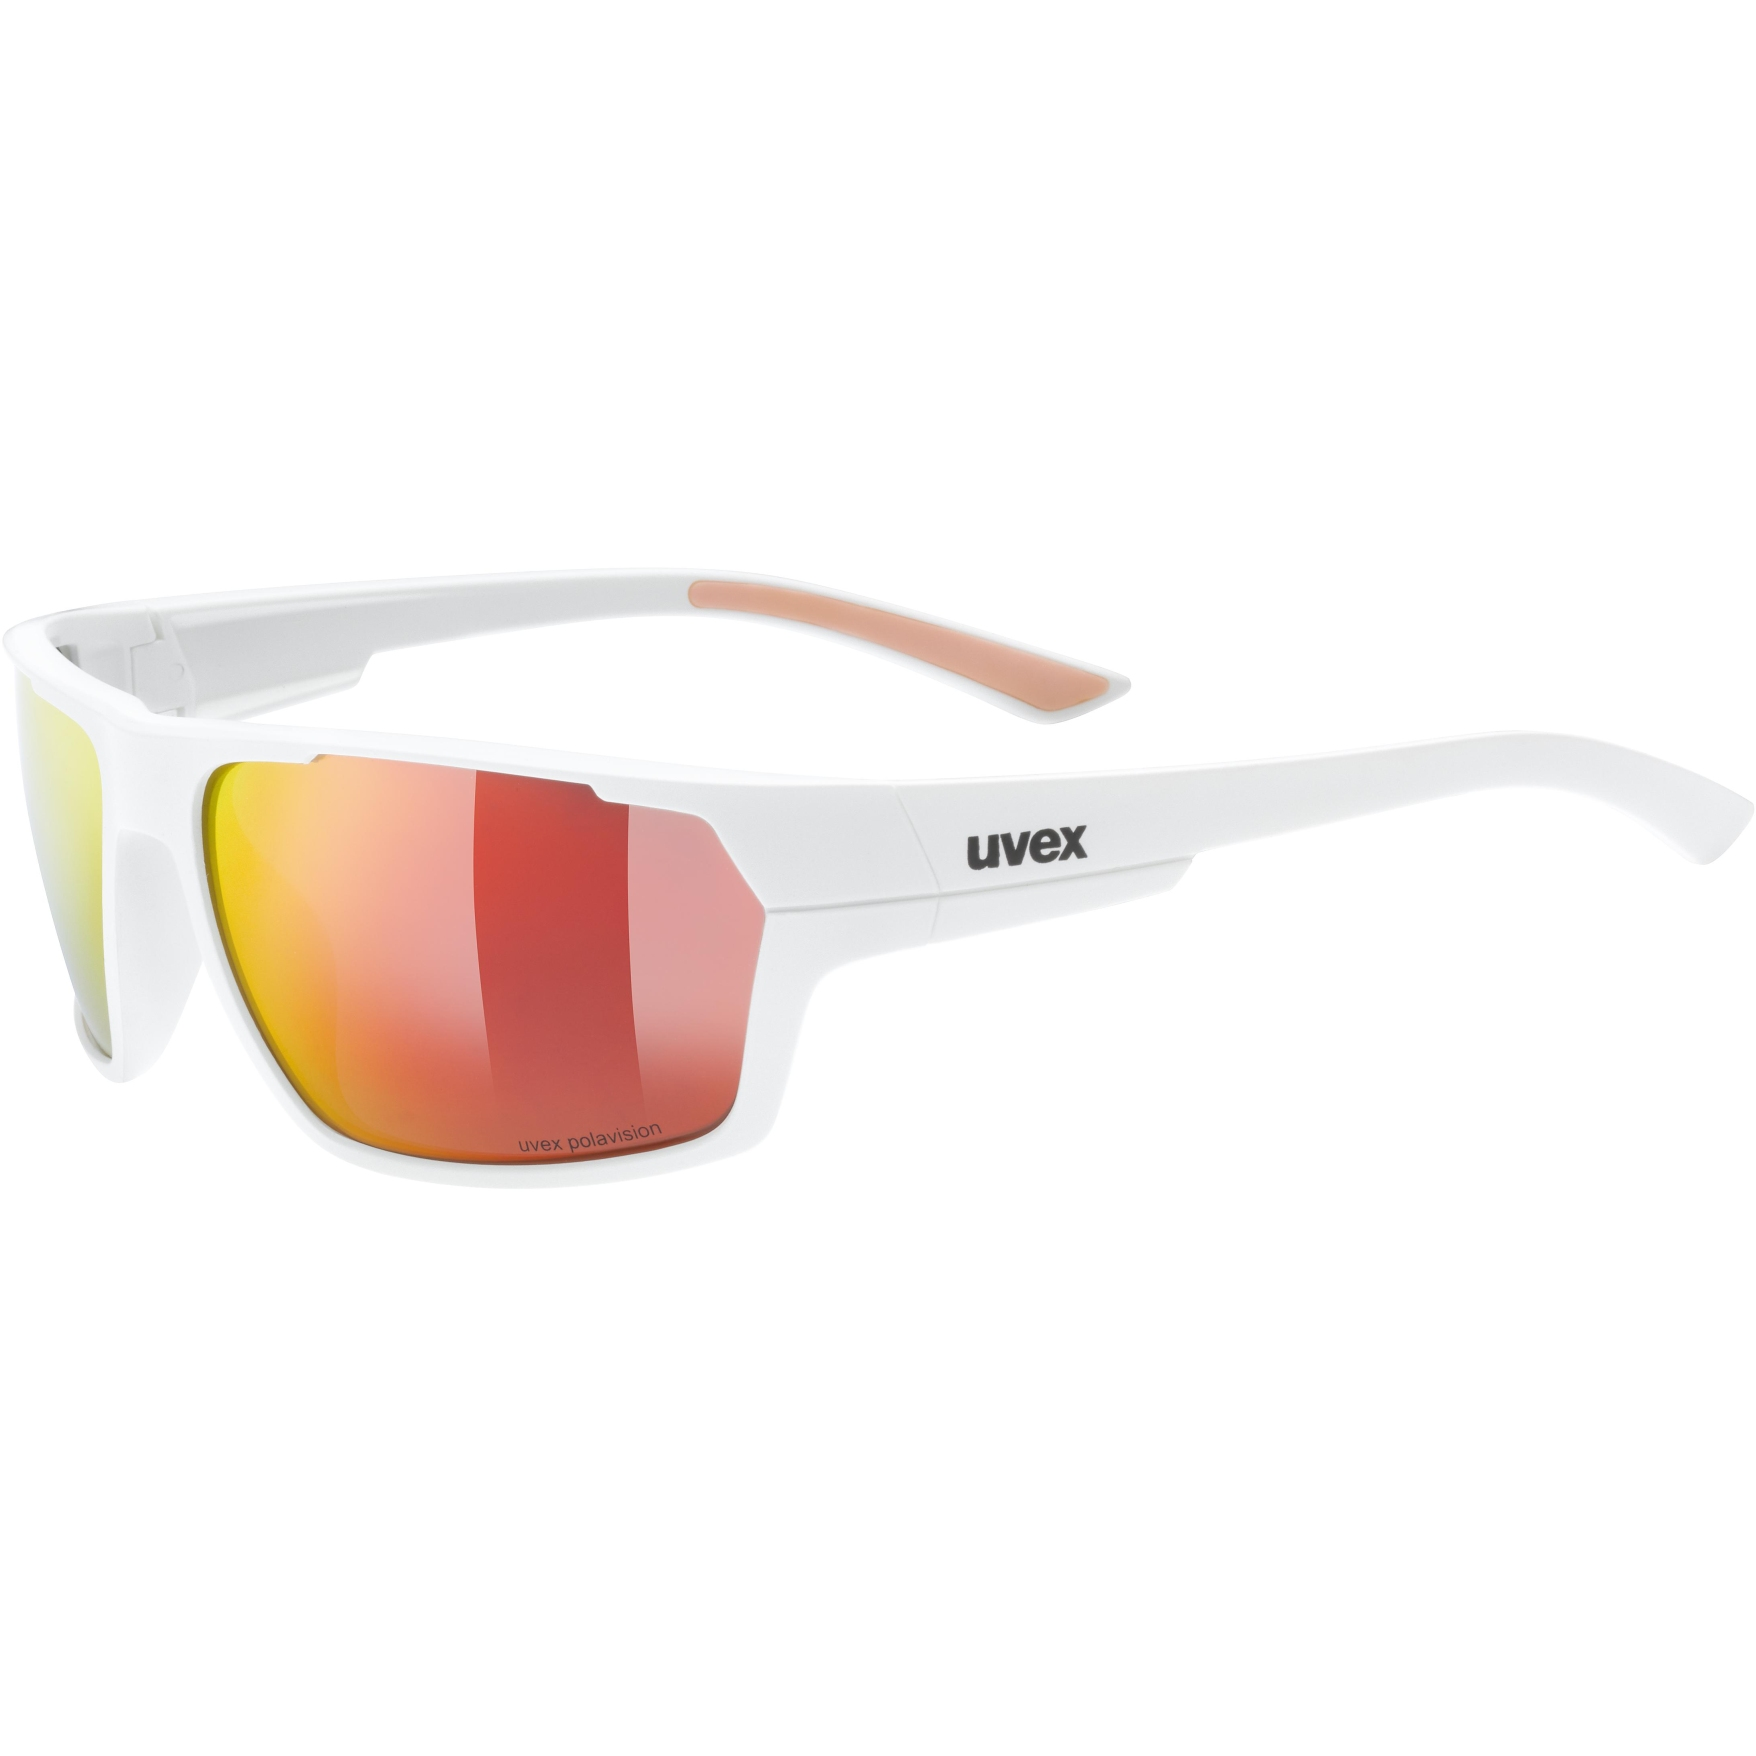 Uvex sportstyle 233 P Glasses - white mat/polavision mirror red